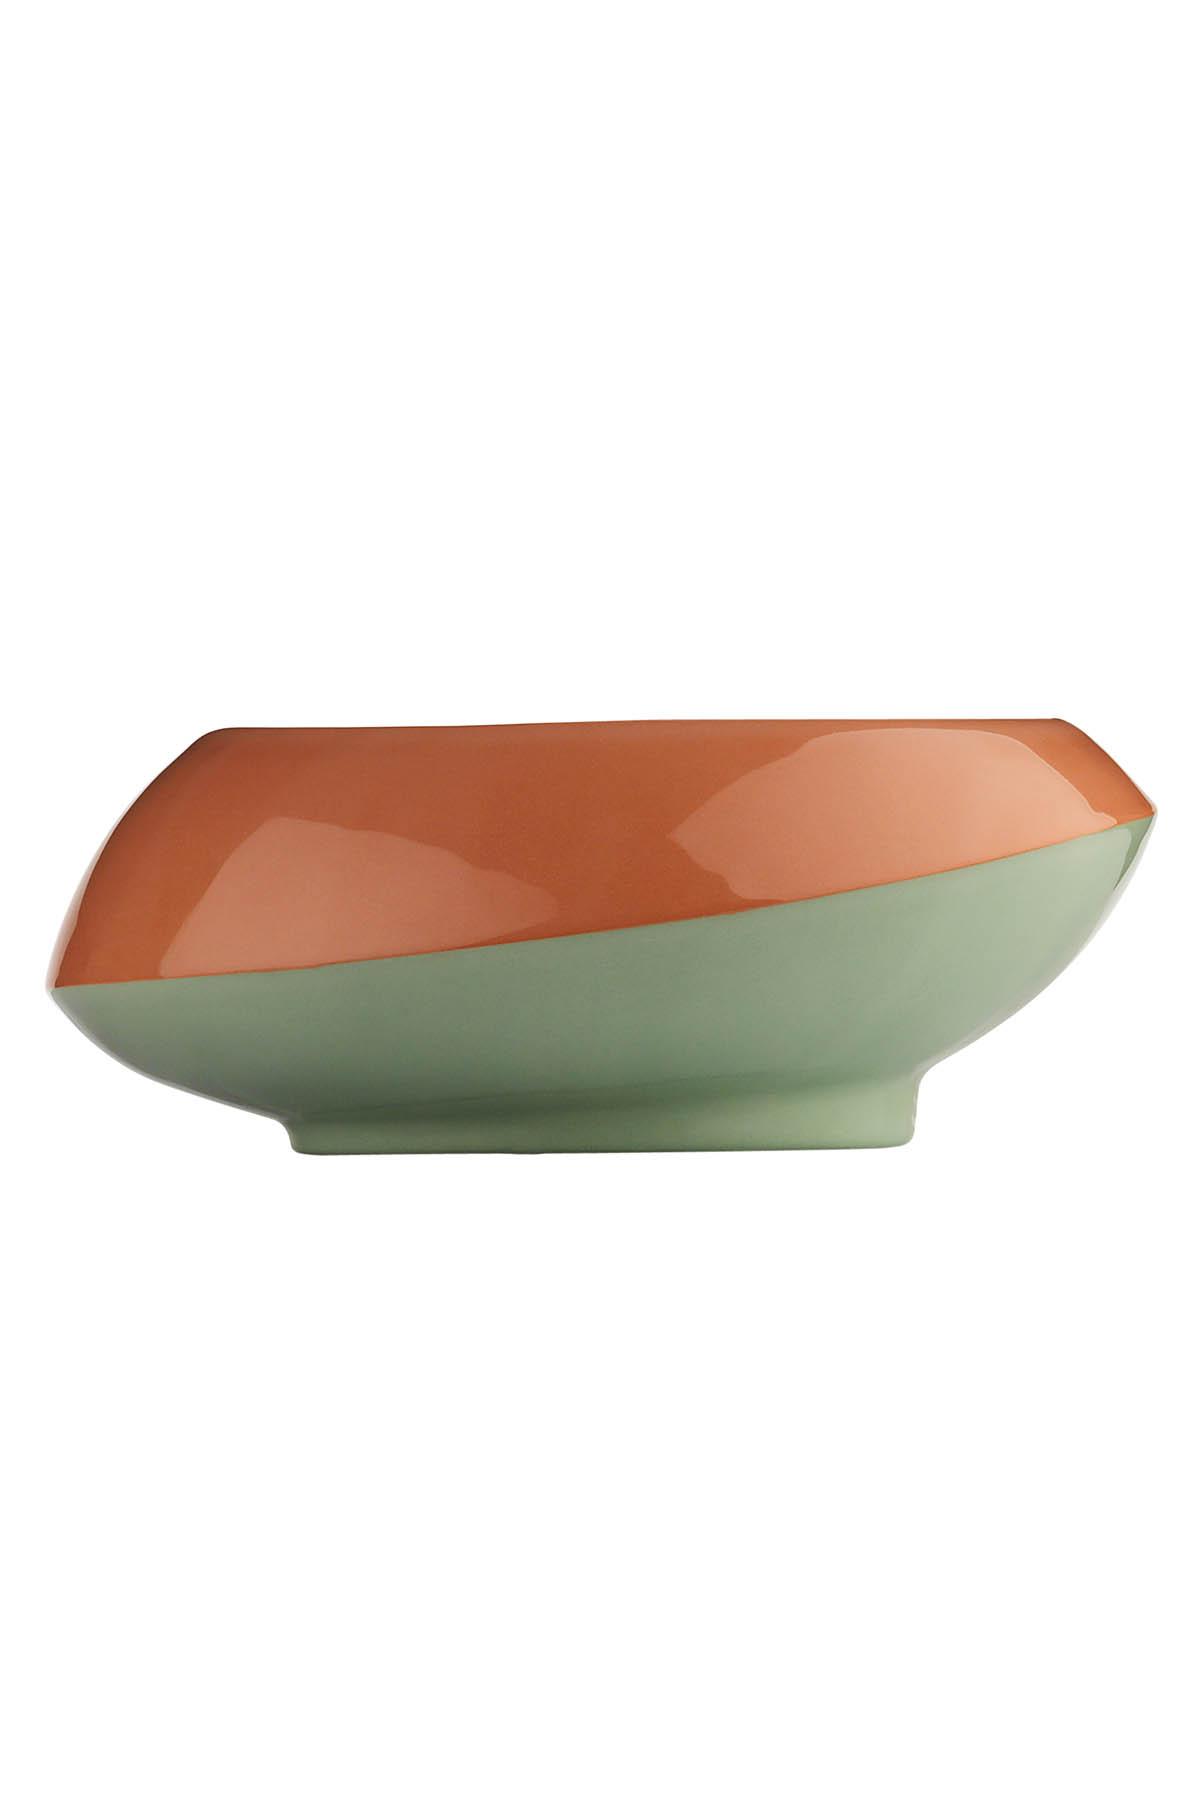 Kütahya Porselen - Aura 23 cm Kase 3 Renkli Yeşil-Kırmızı-Siyah